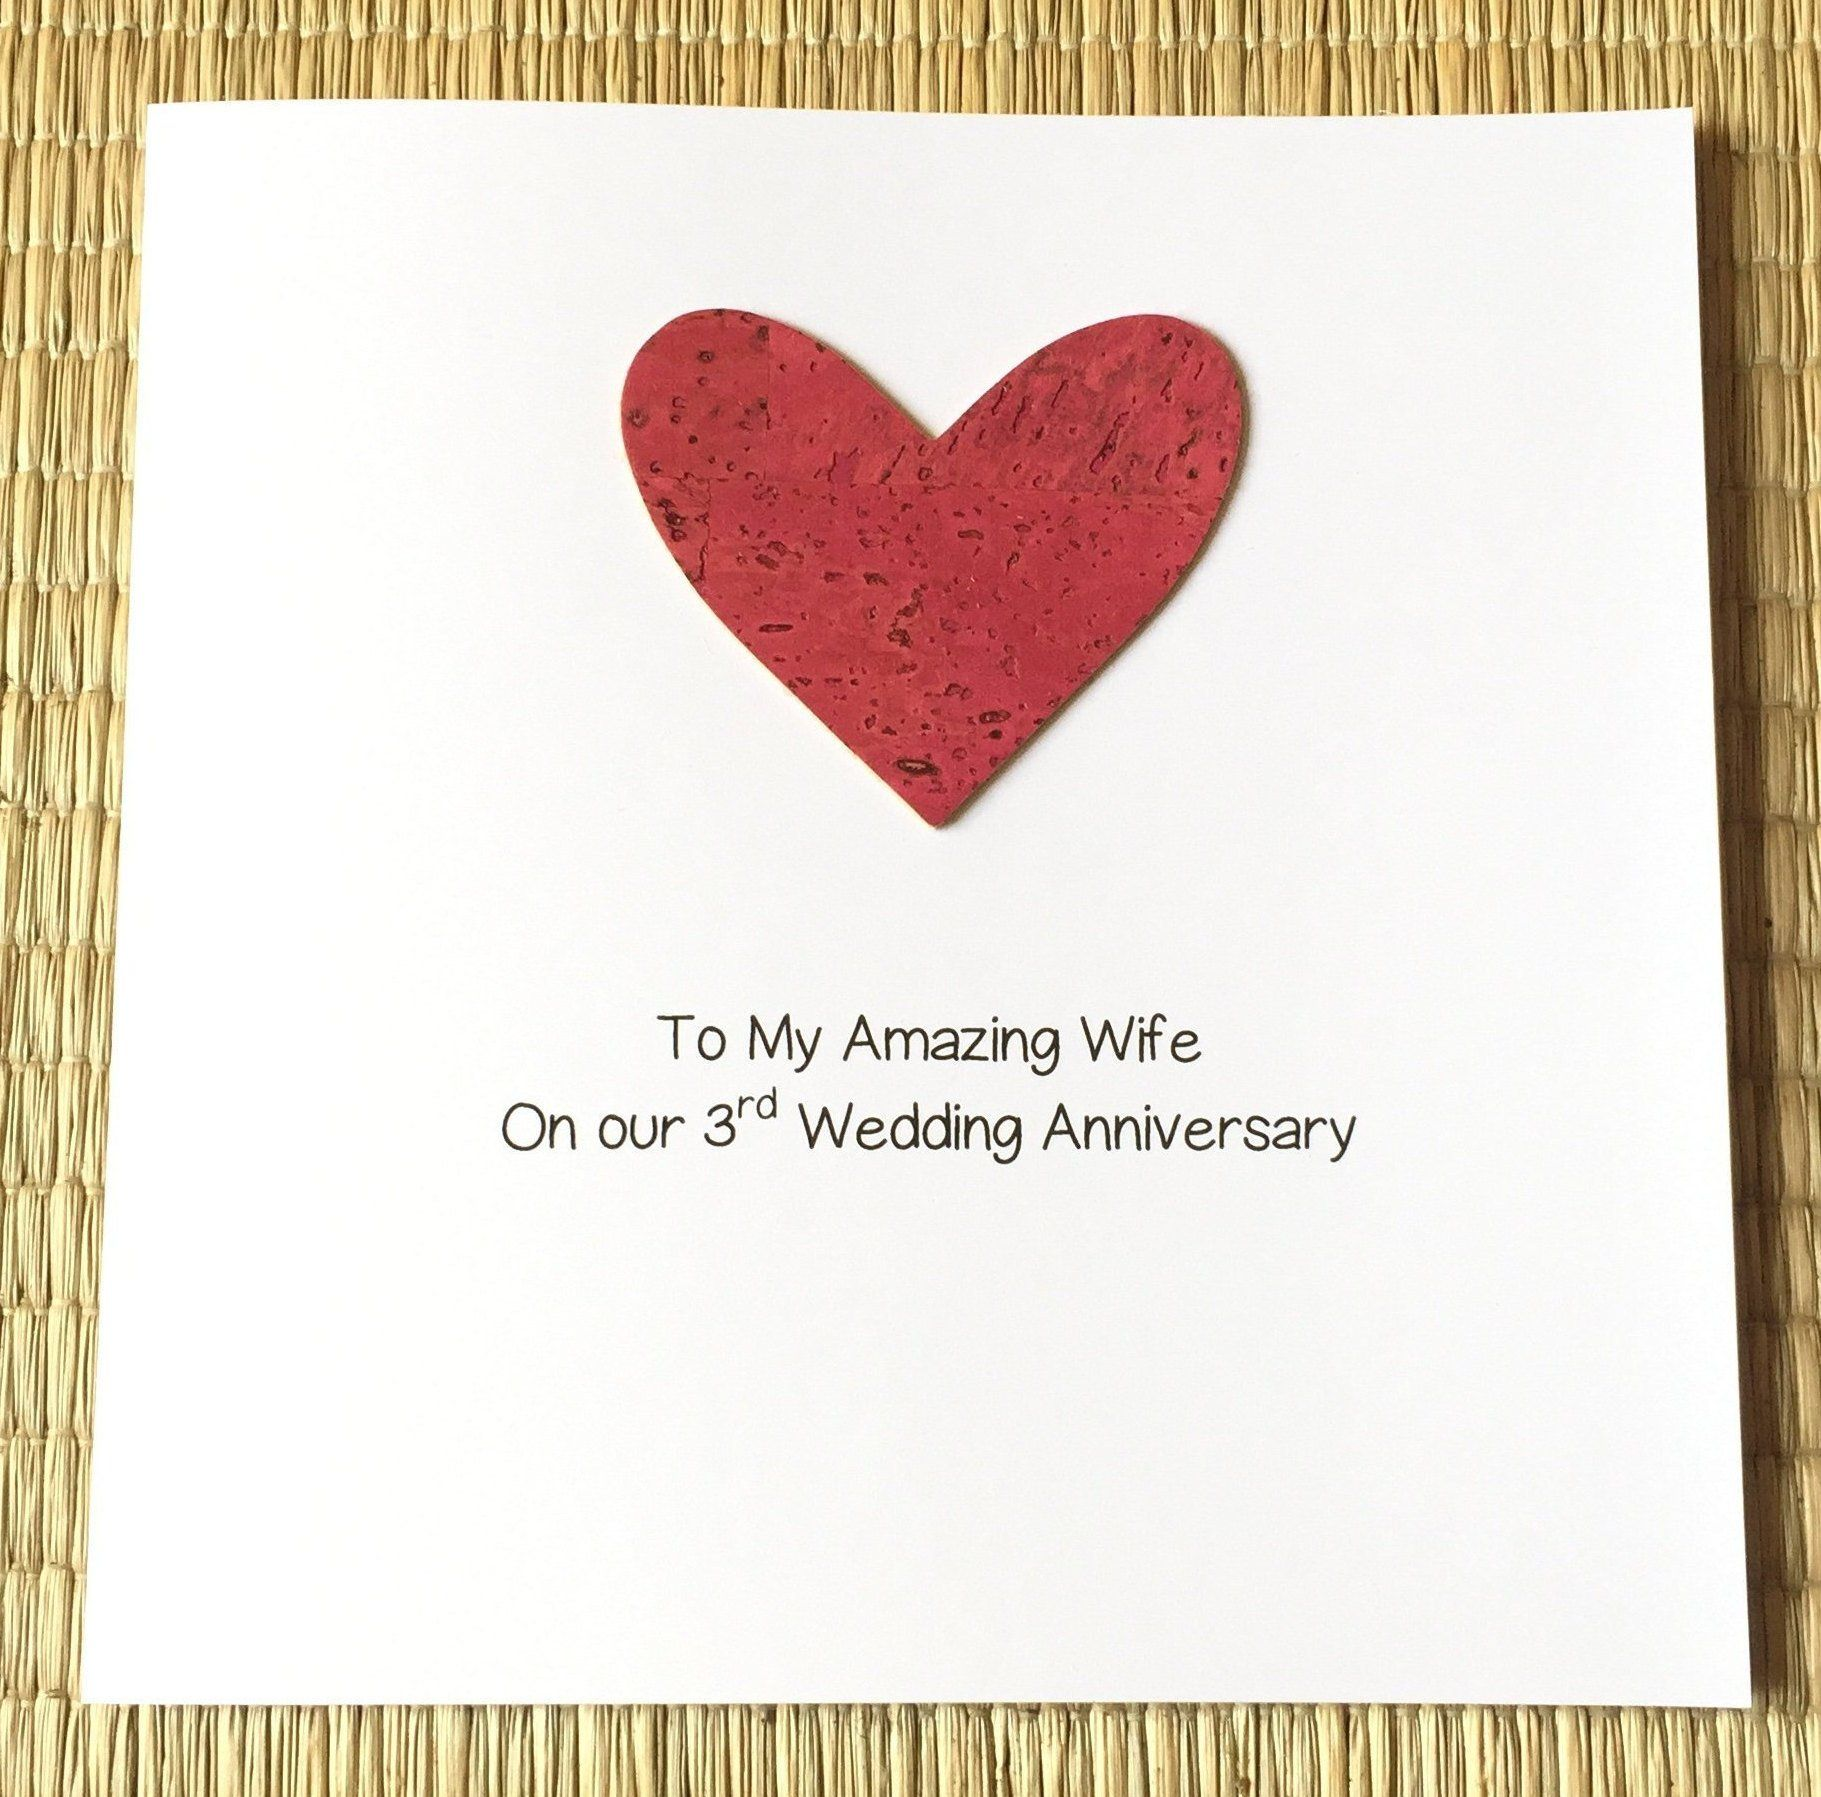 3rd wedding anniversary card vegan cork leather